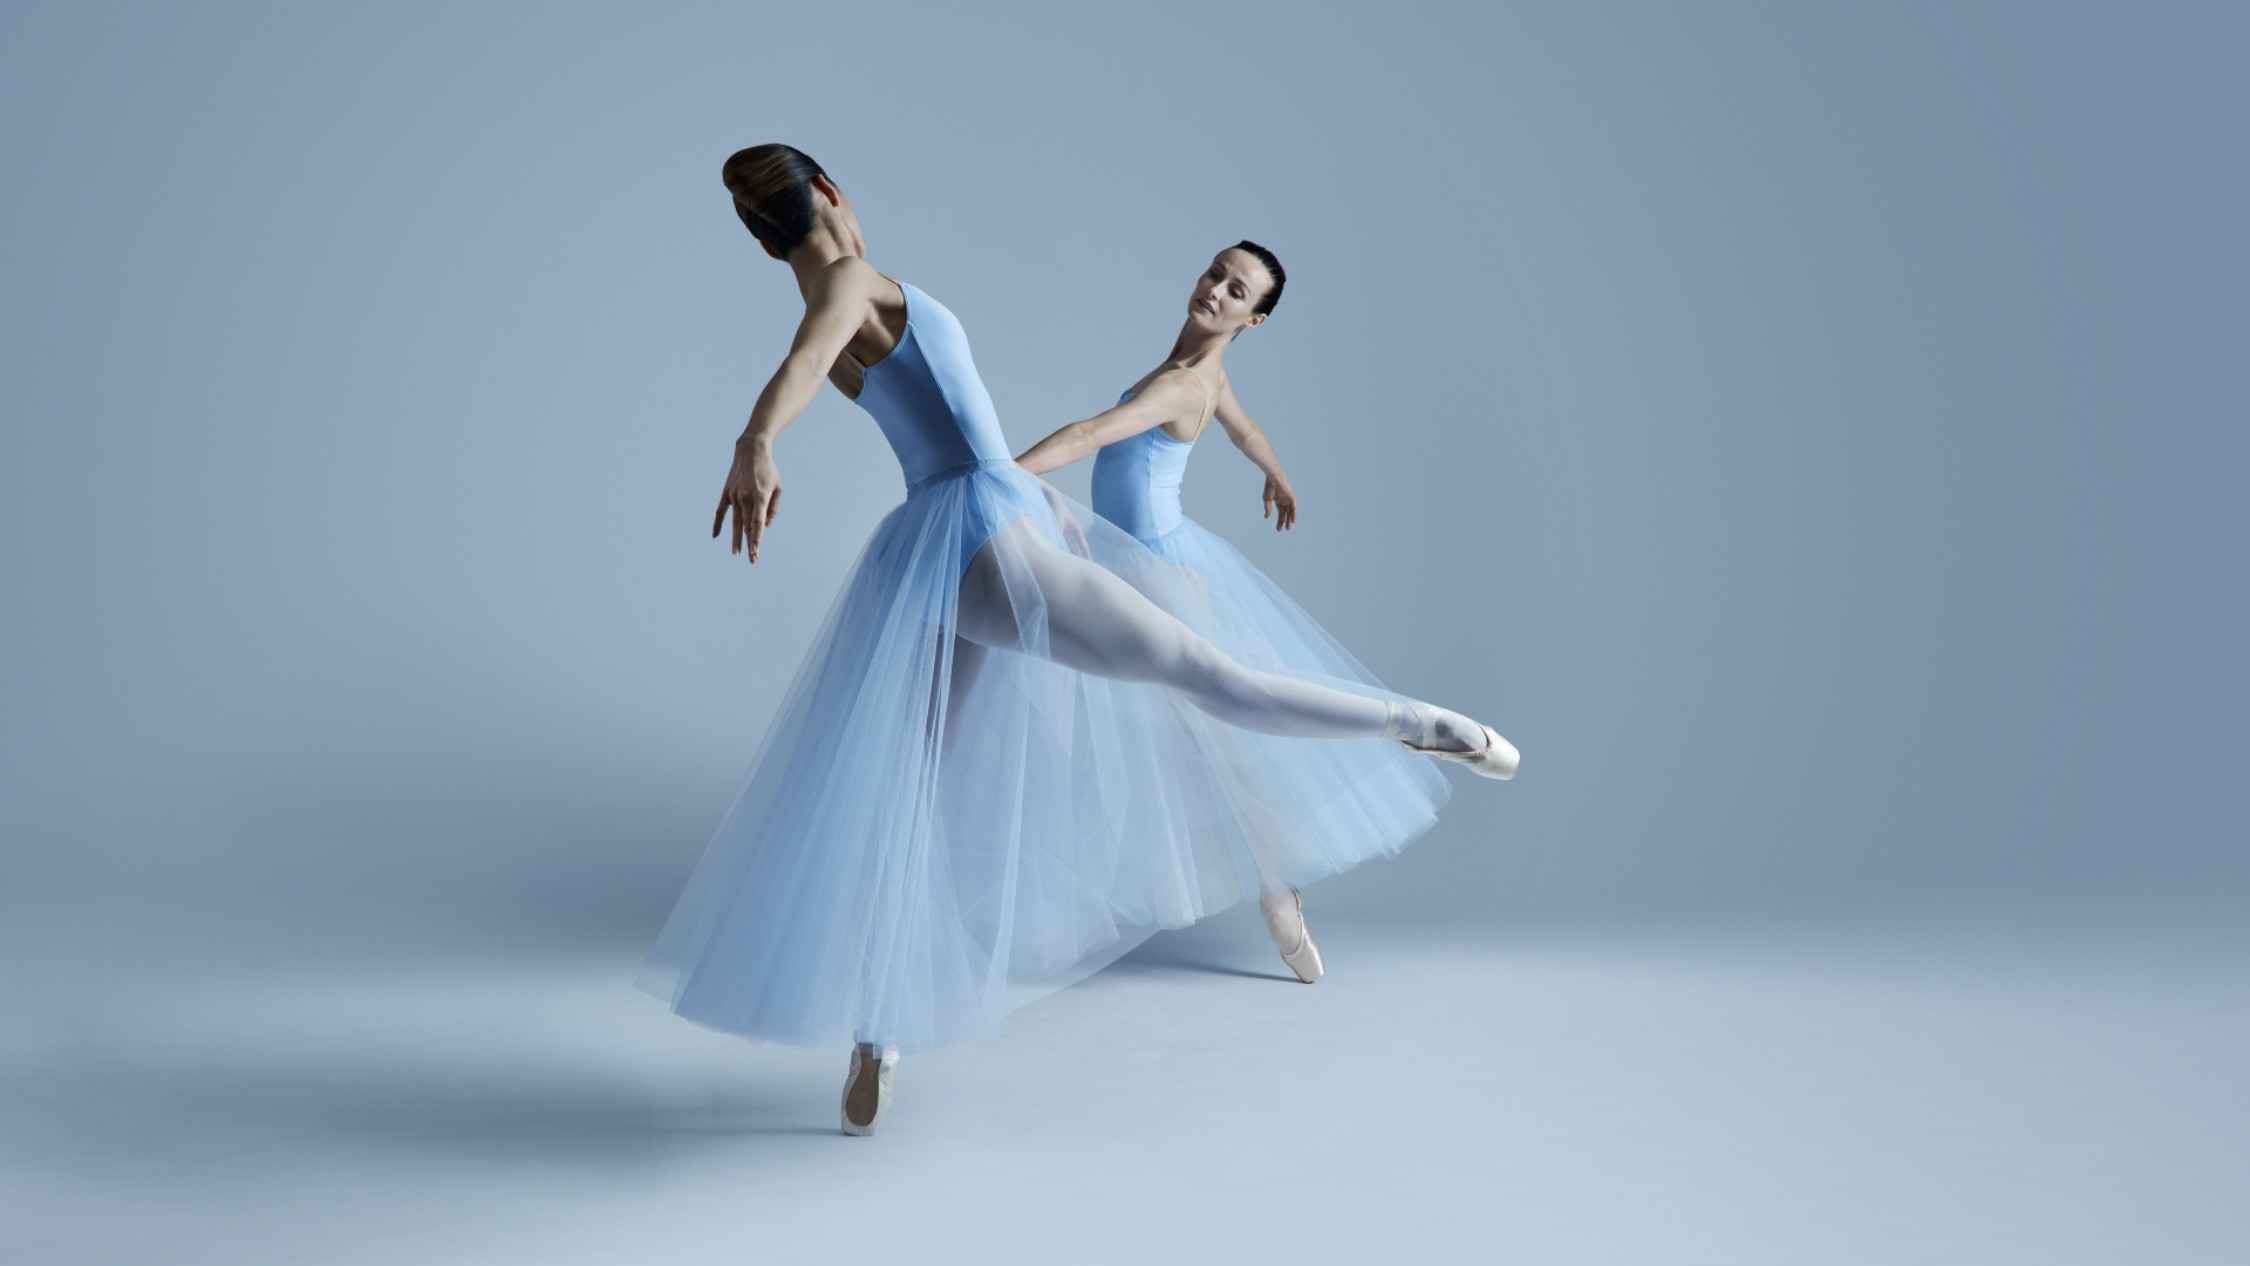 Dancers Ako Kondo and Amber Scott in a pas de deux in pale blue, long tutus